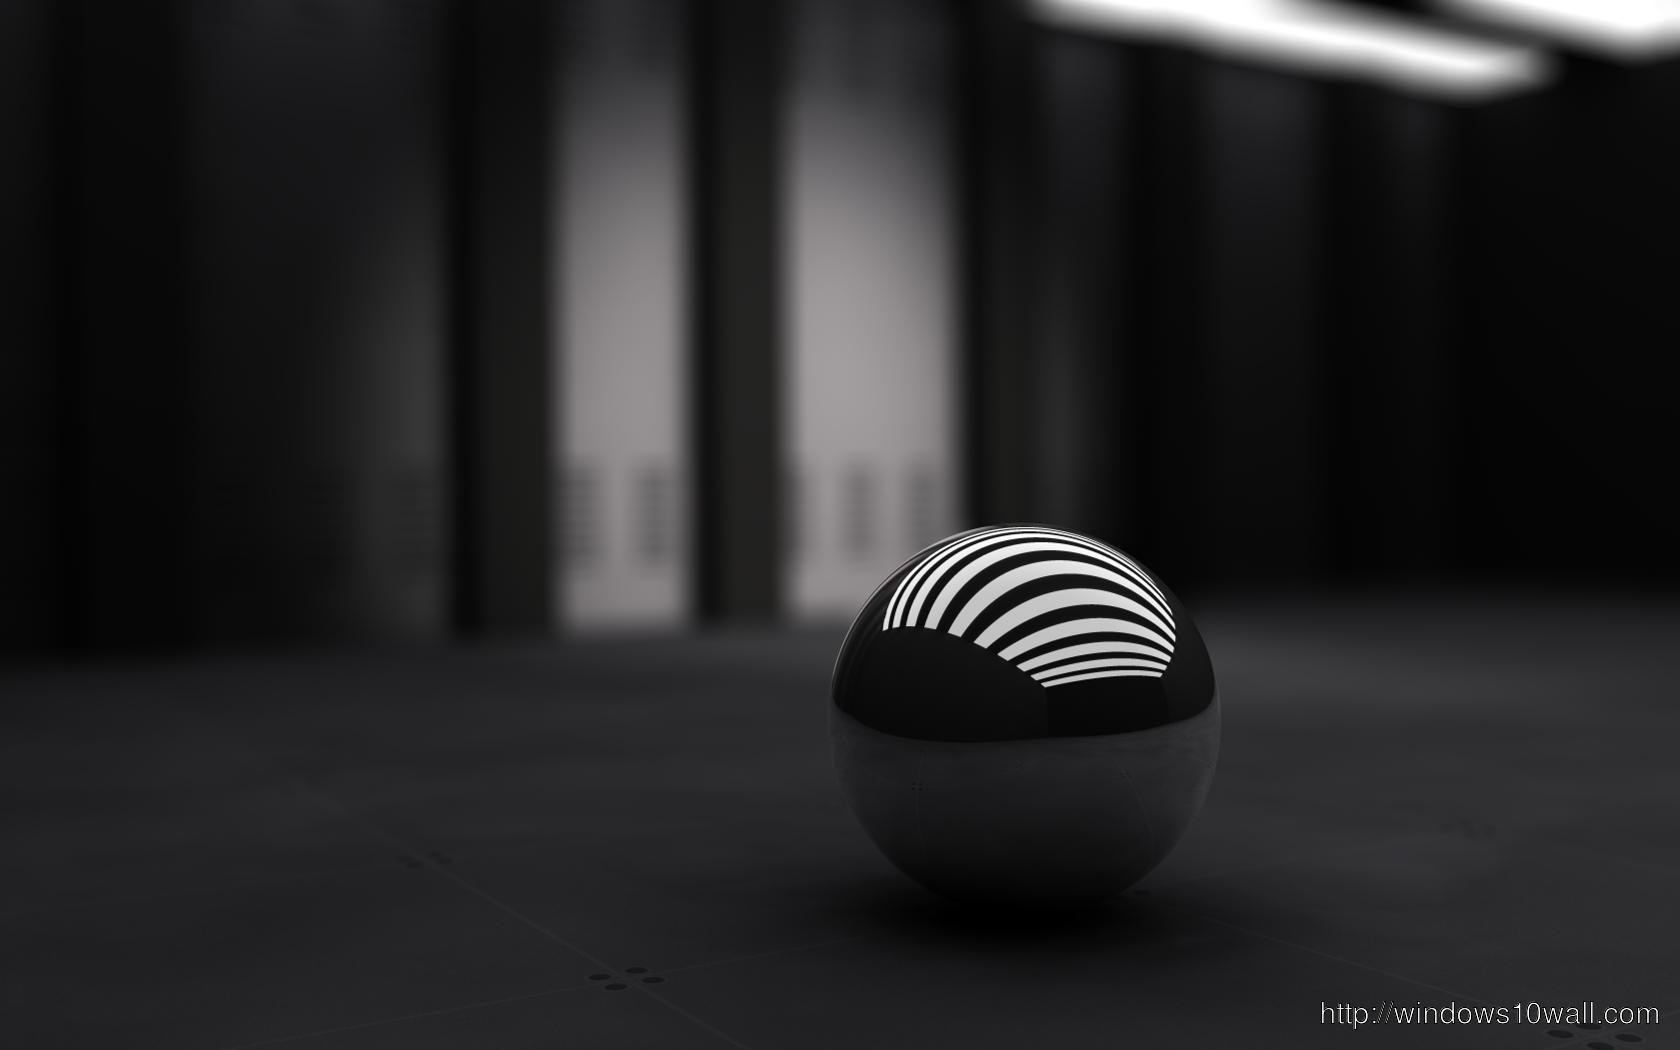 3D Black Ball Background Wallpaper